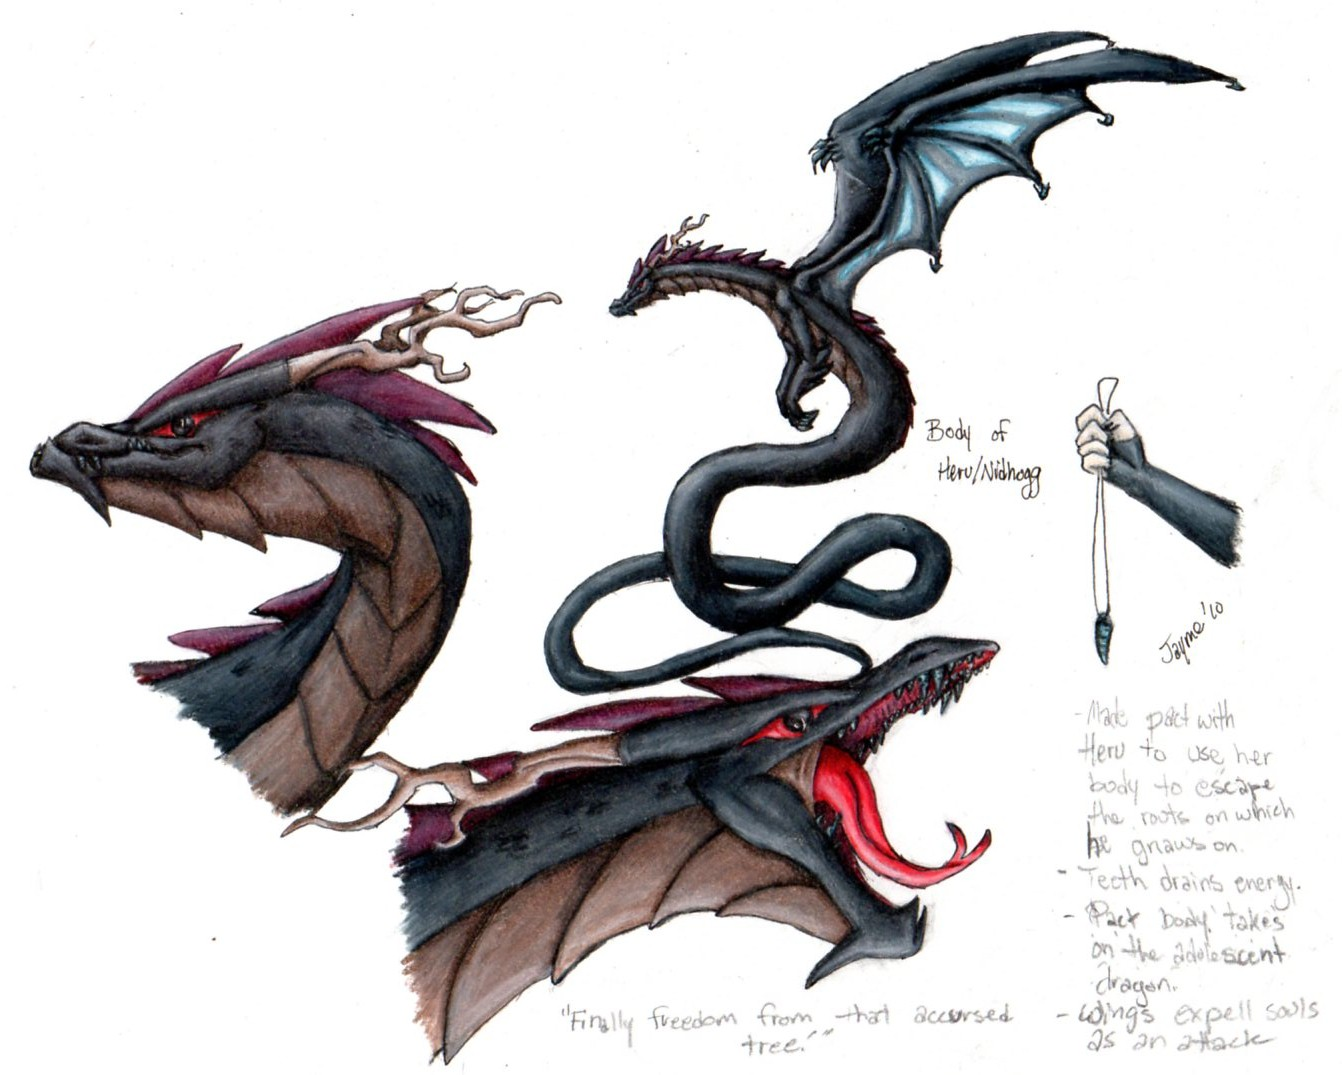 Dragon Design 1 - Nidhogg-Heru by Fai-Ness on DeviantArt